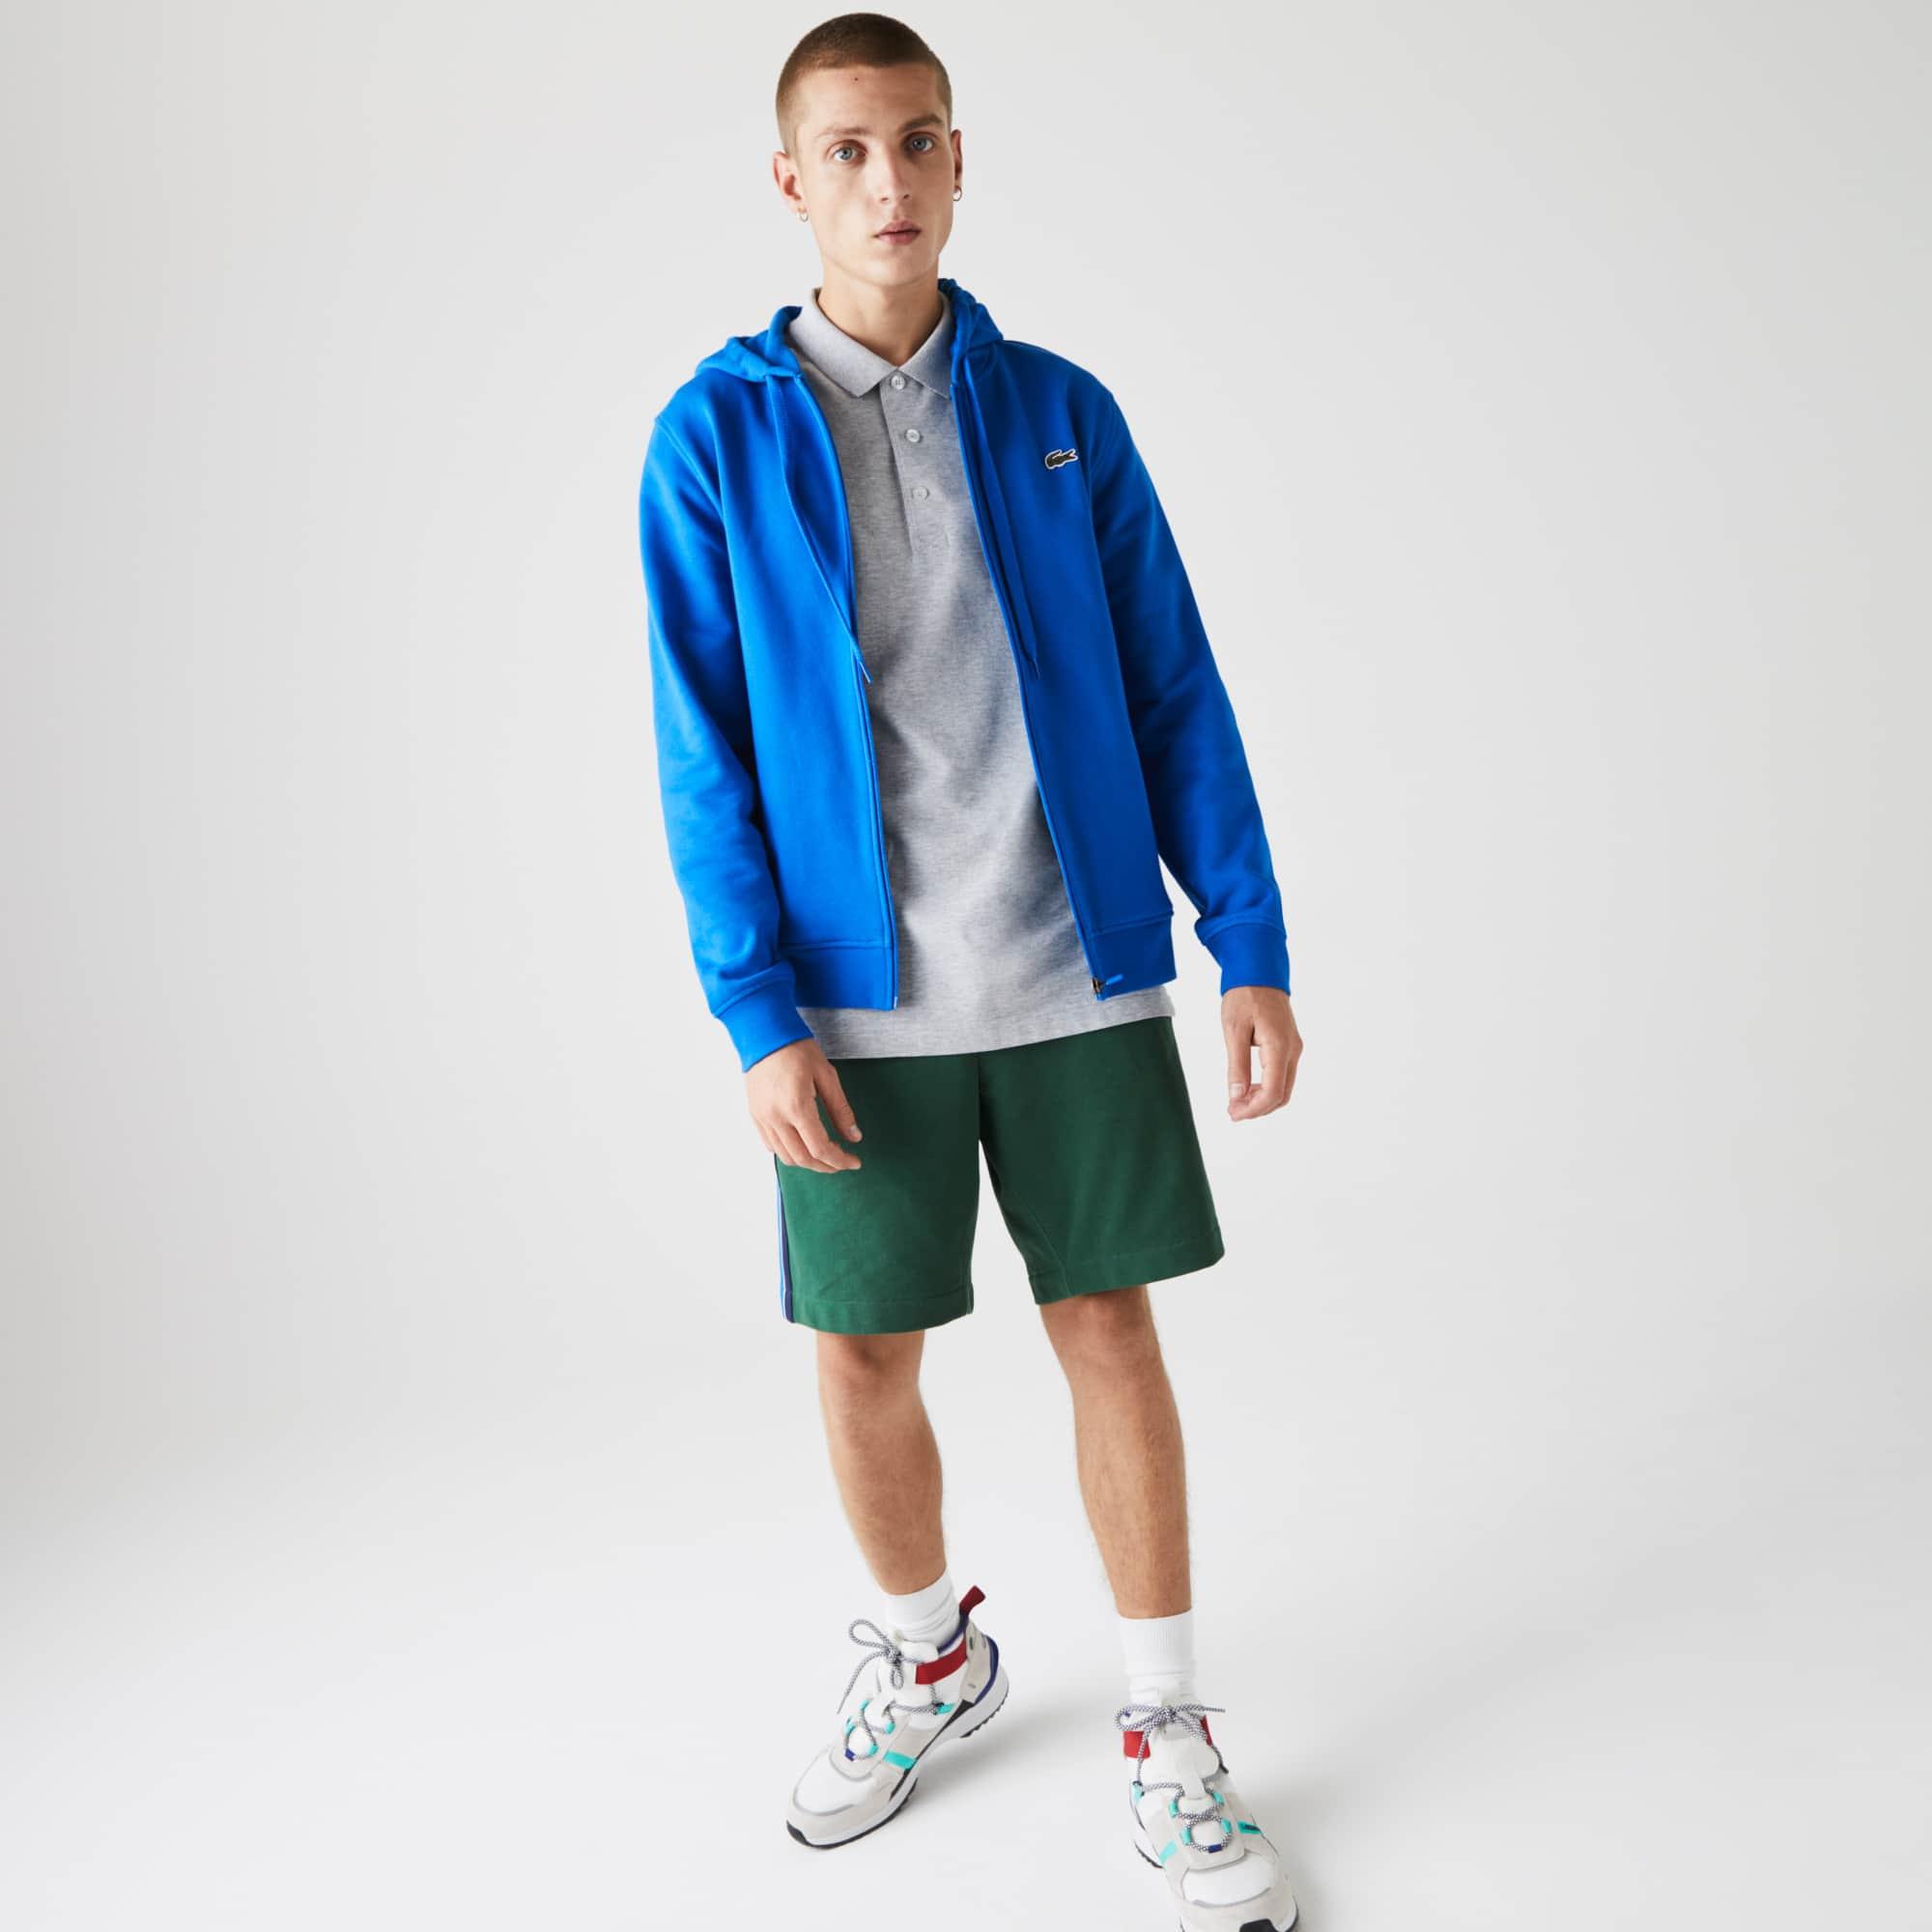 Lacoste Mens SPORT Hooded Lightweight Bi-material Sweatshirt